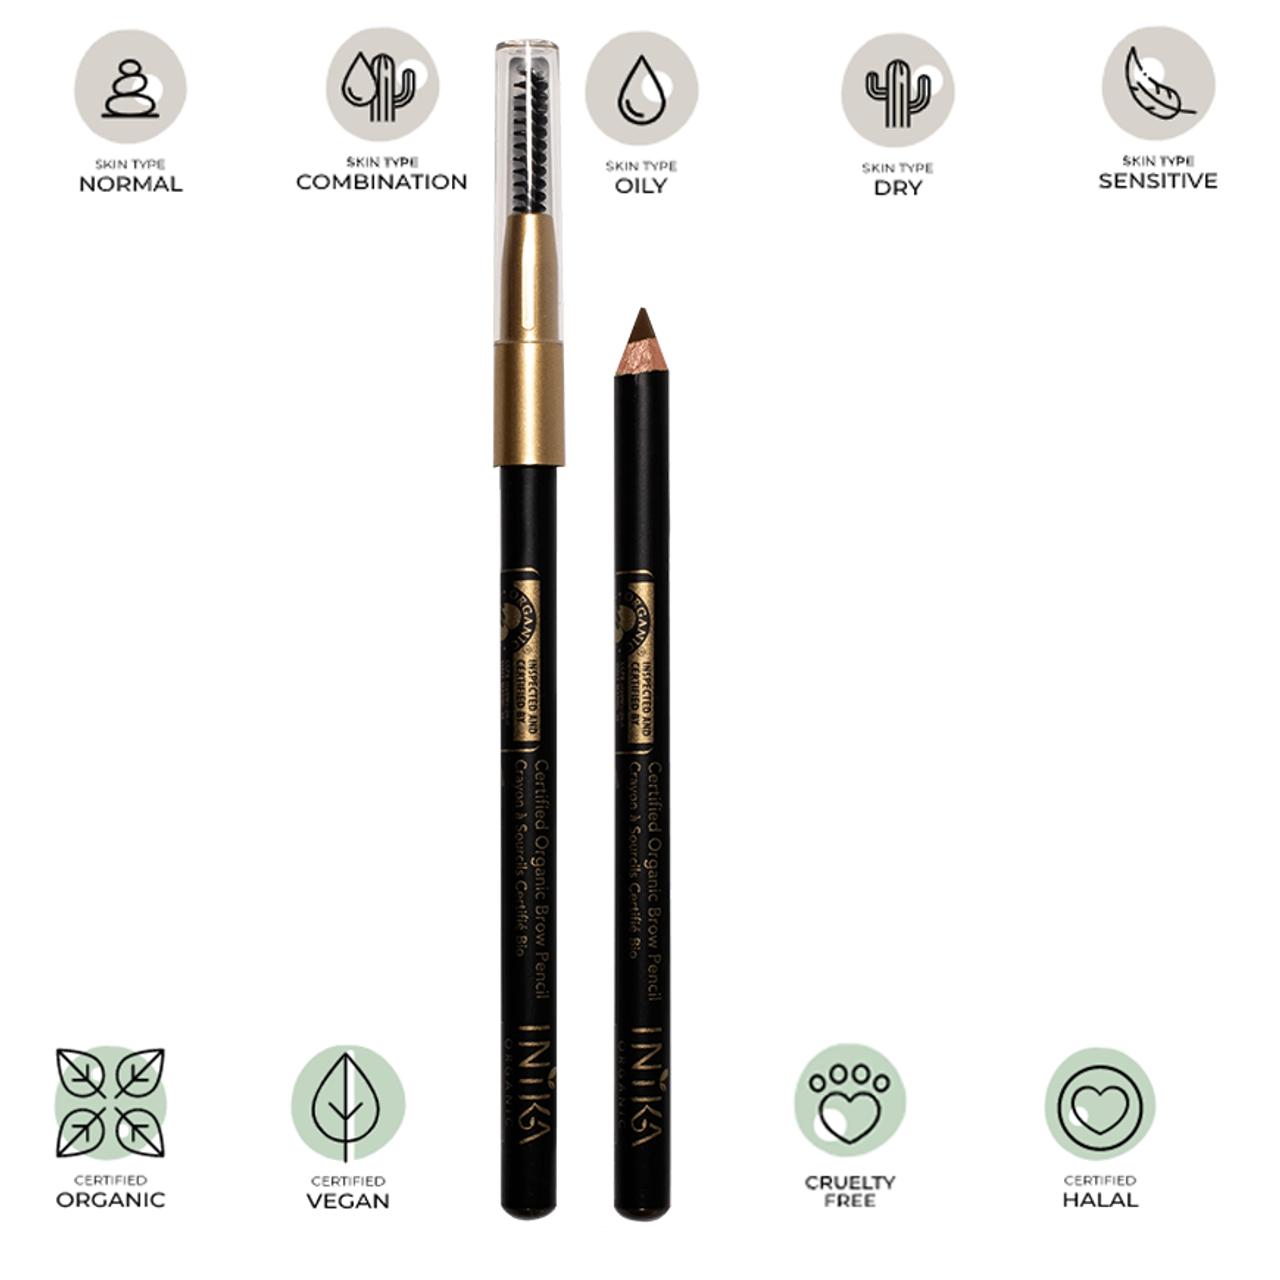 Certified Organic Brow Pencil (Brunette Beauty) 1.2g